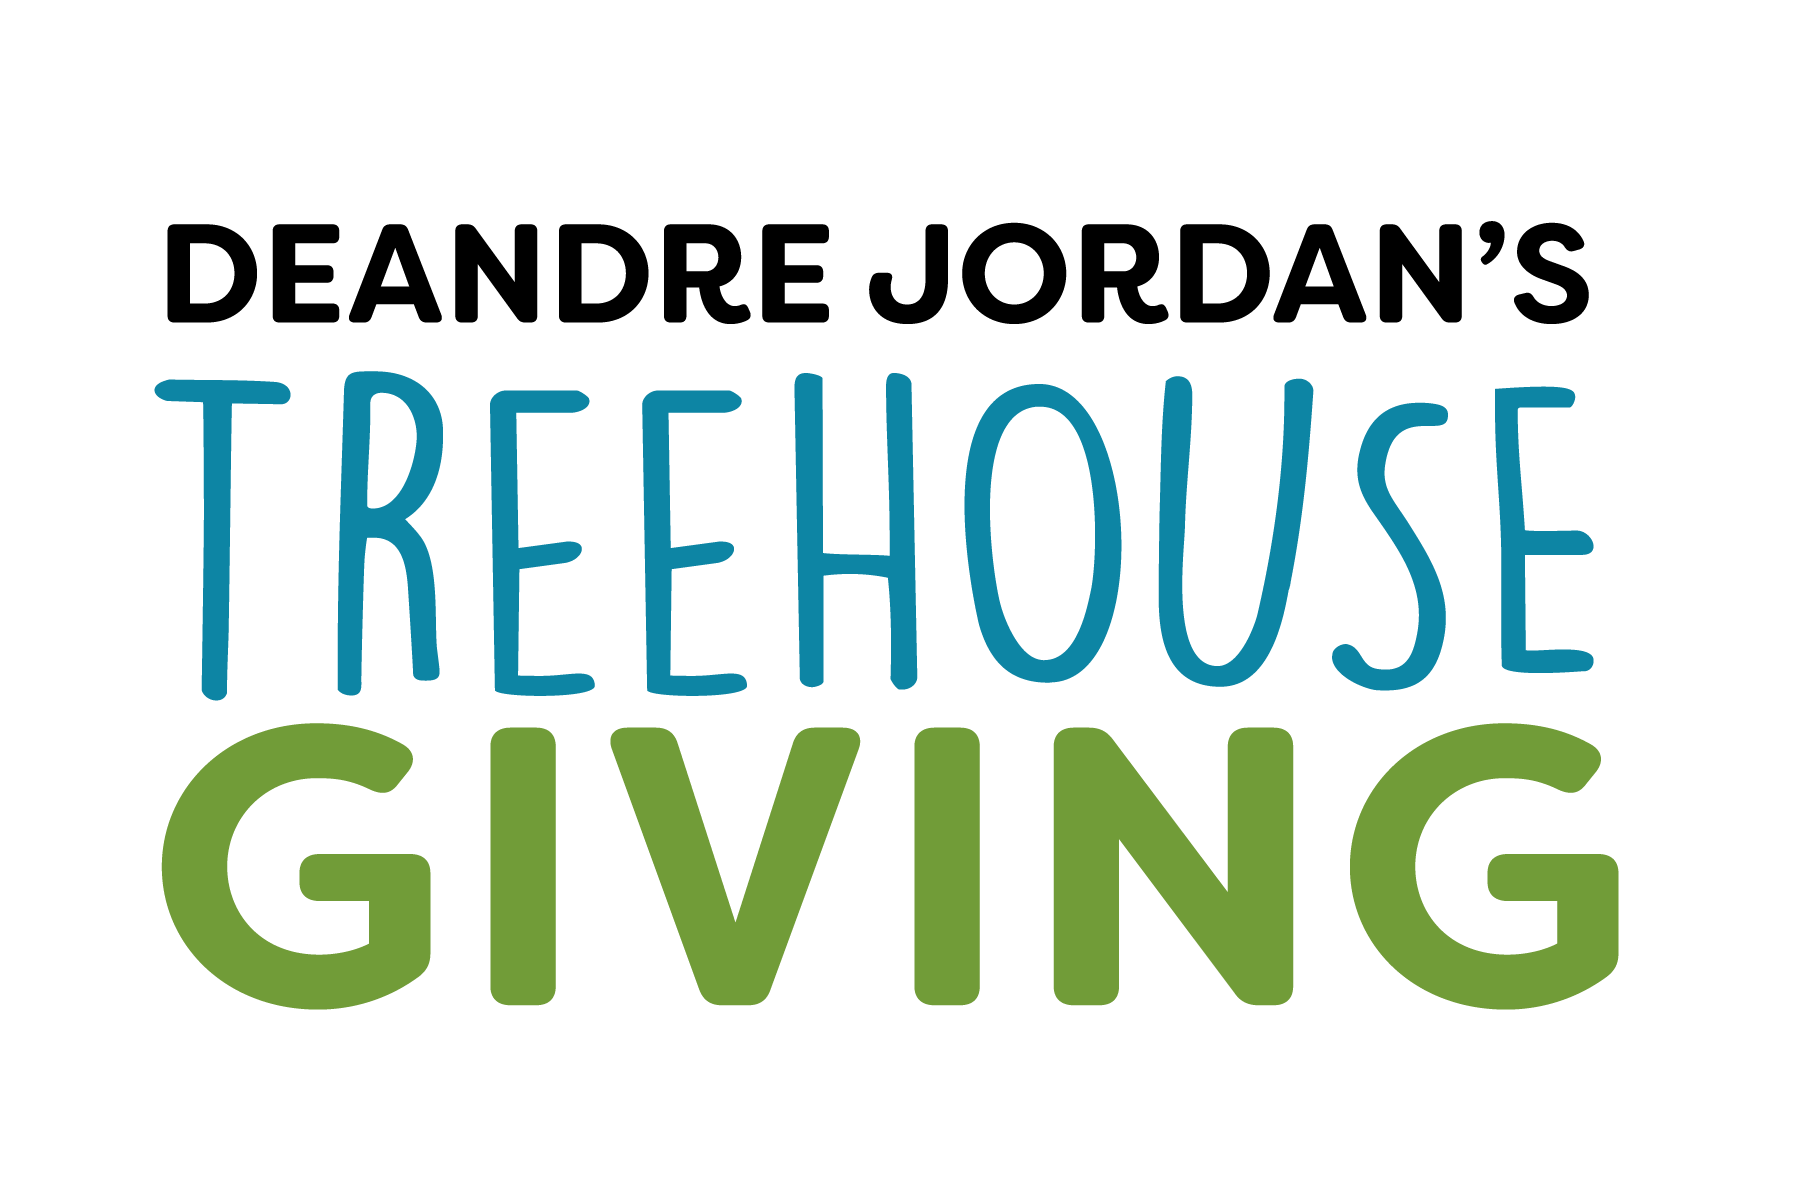 DeandreJordan_GivingTreehouse_Text.png